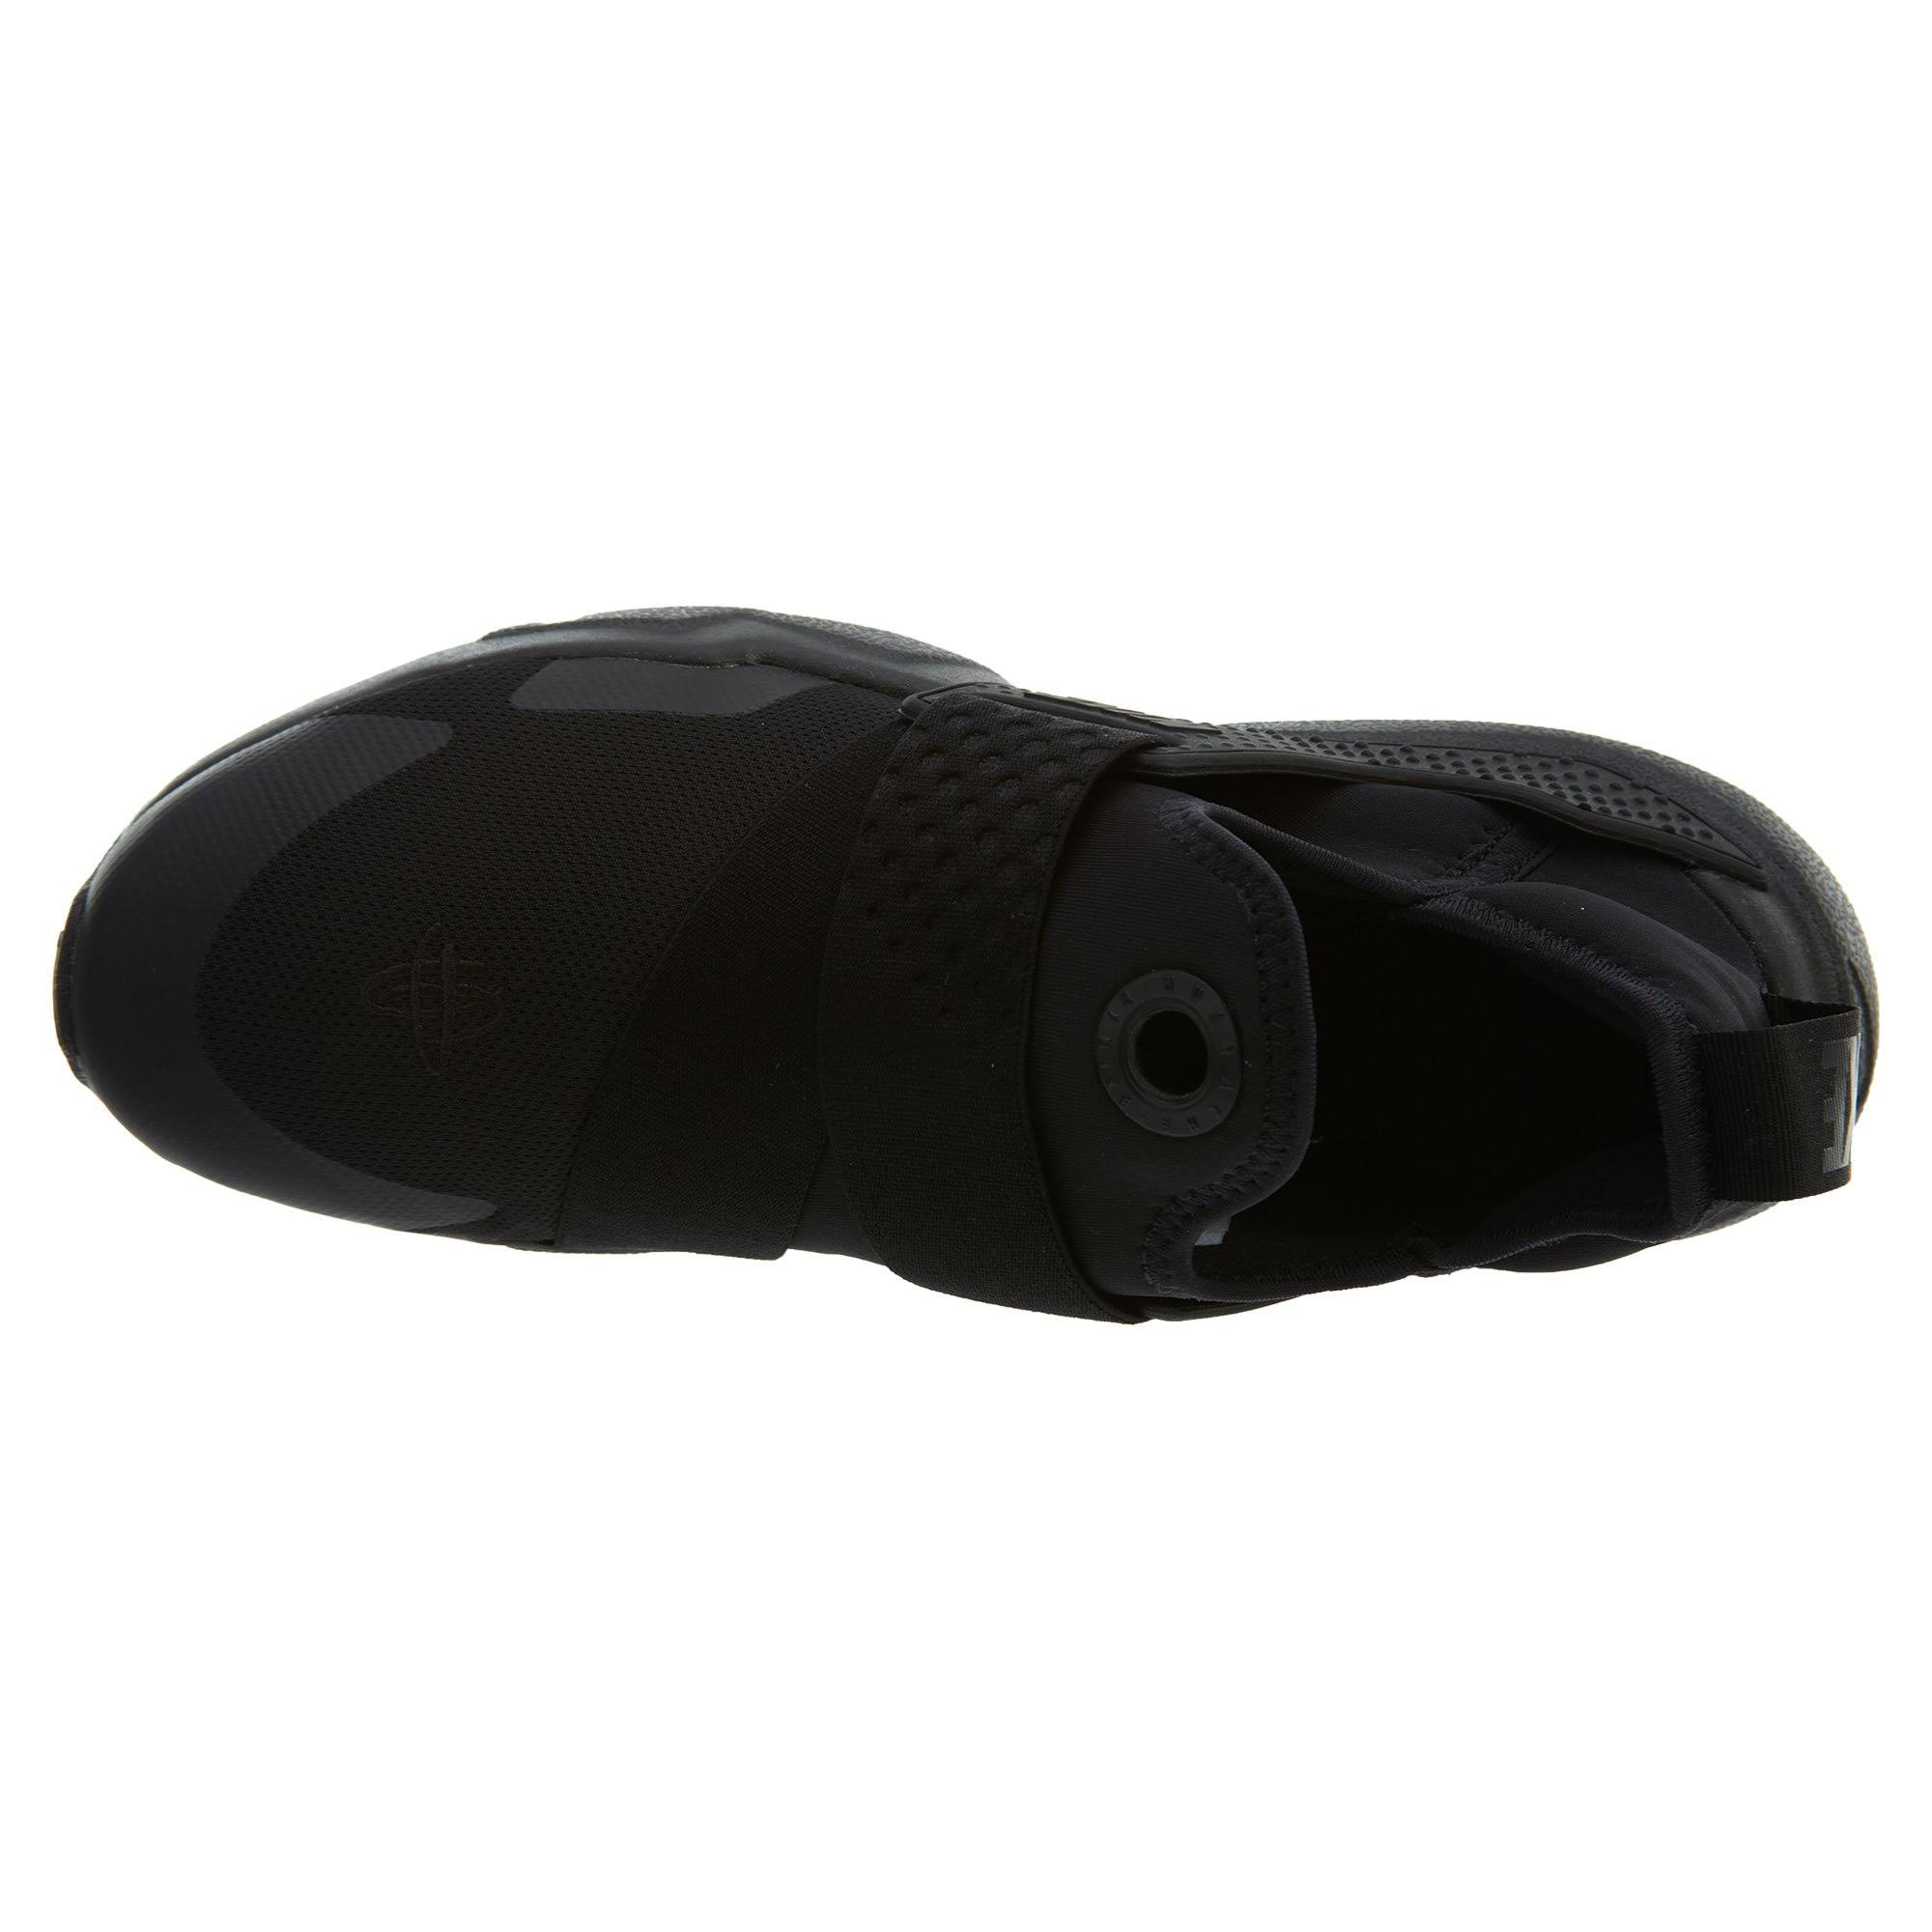 Boys Black Huarache Aq0575004 Grade School Shoes Nike Extreme OFqEpH